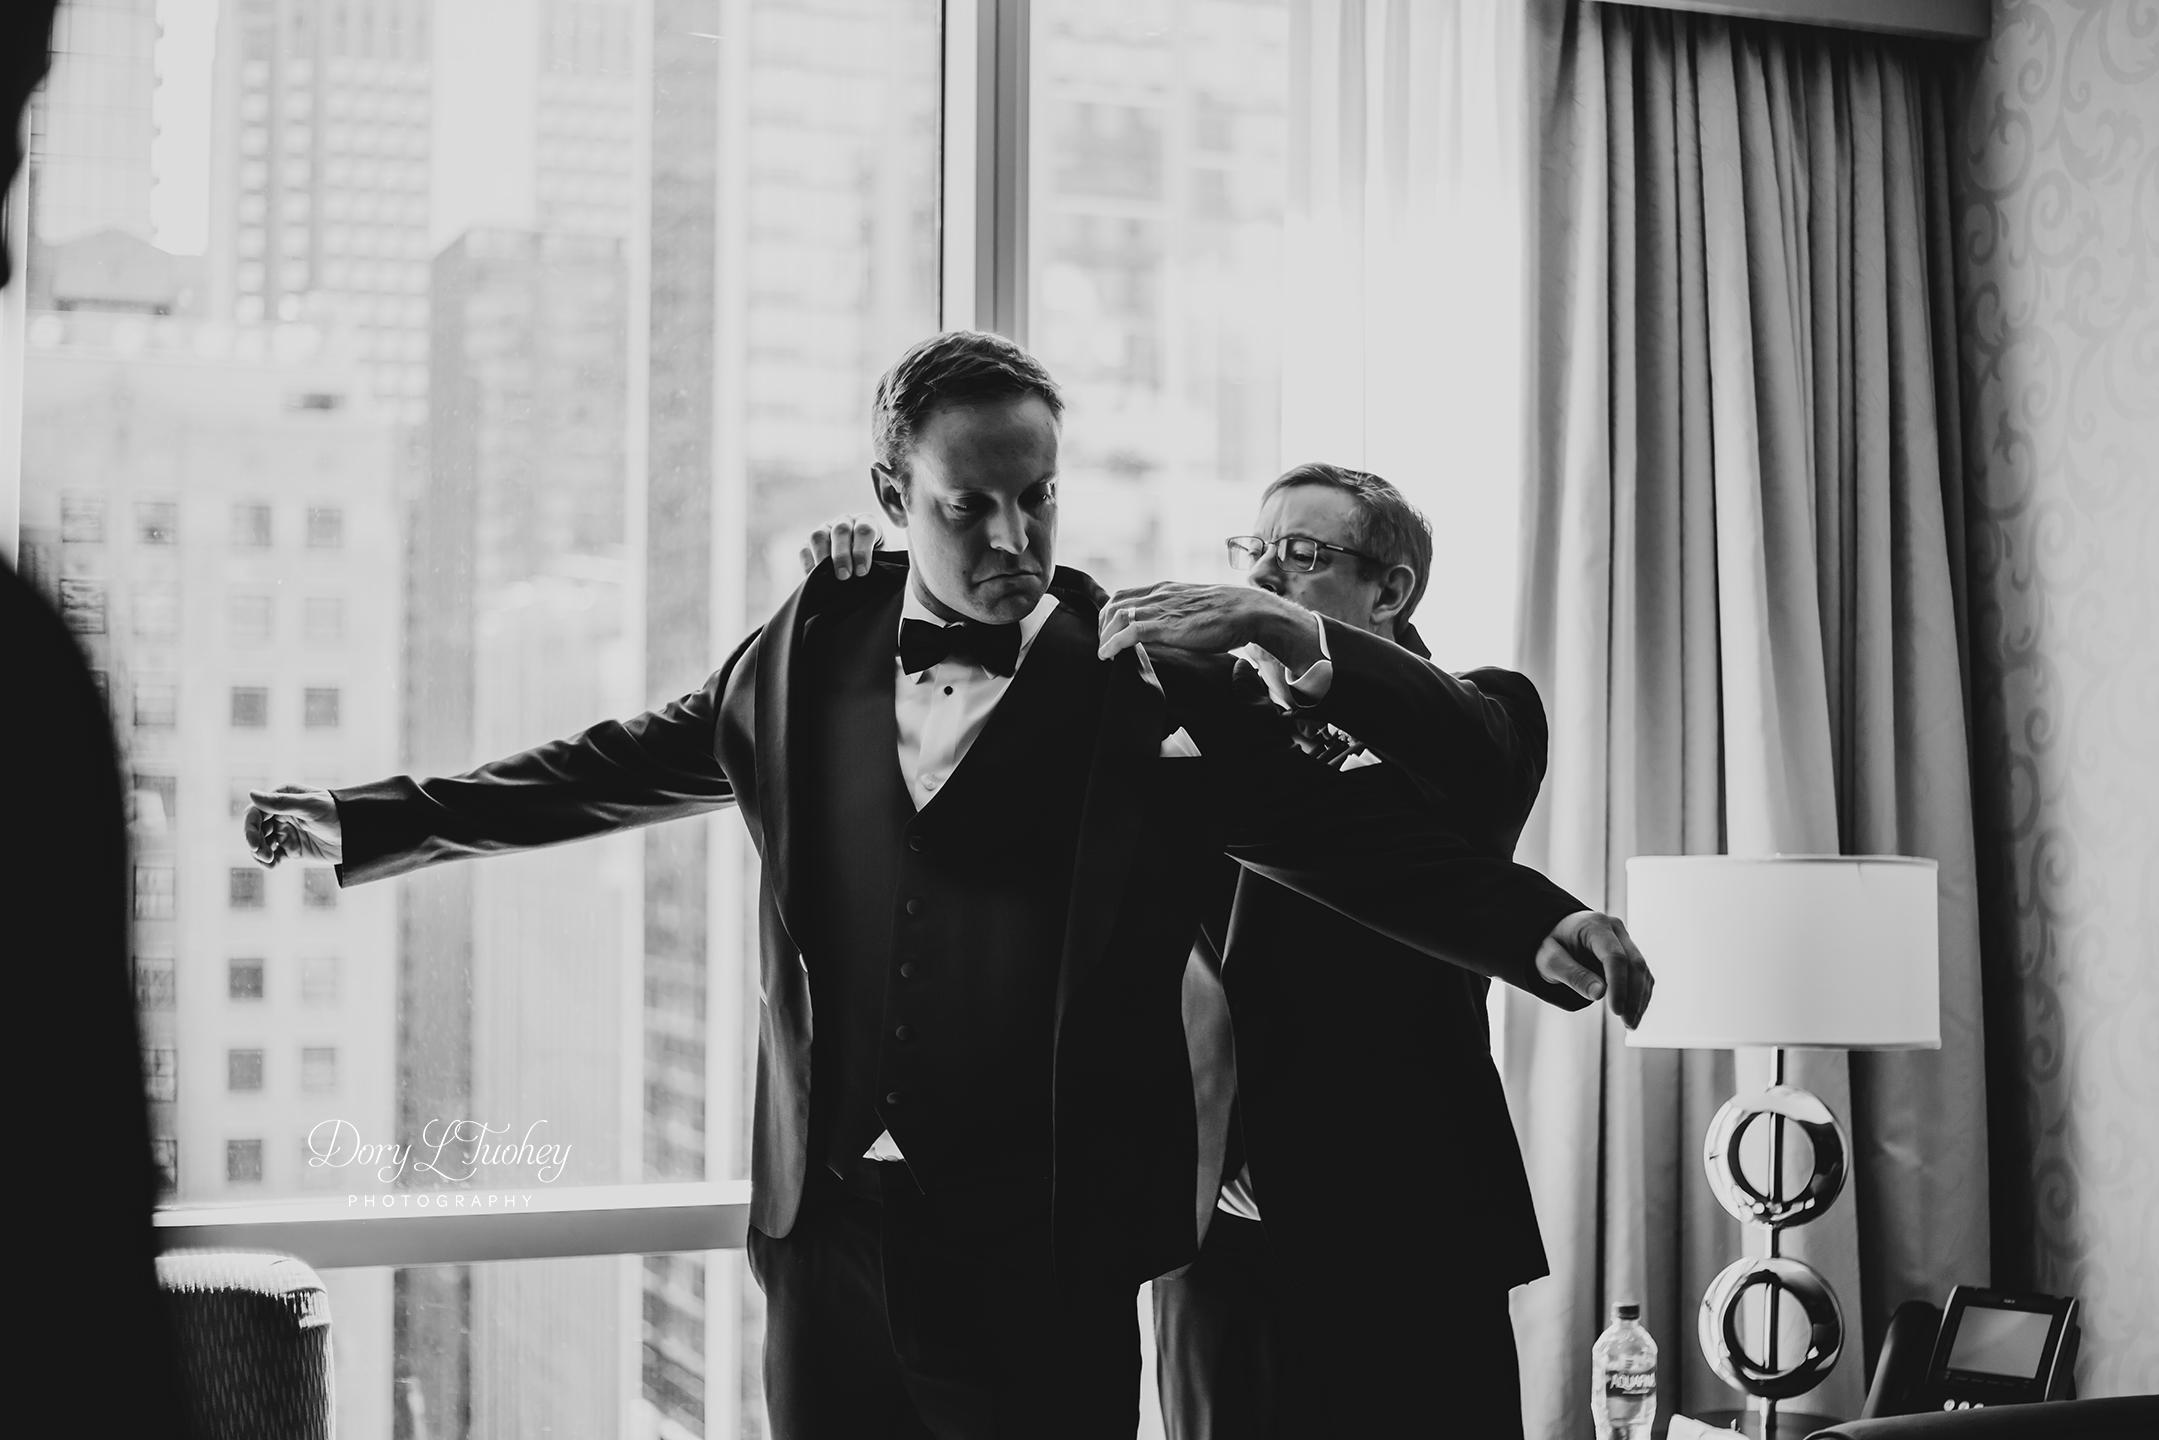 Wedding_chicago_bride_groom_photographer_wisconsin_gren_bay_wit_loyola_05.jpg